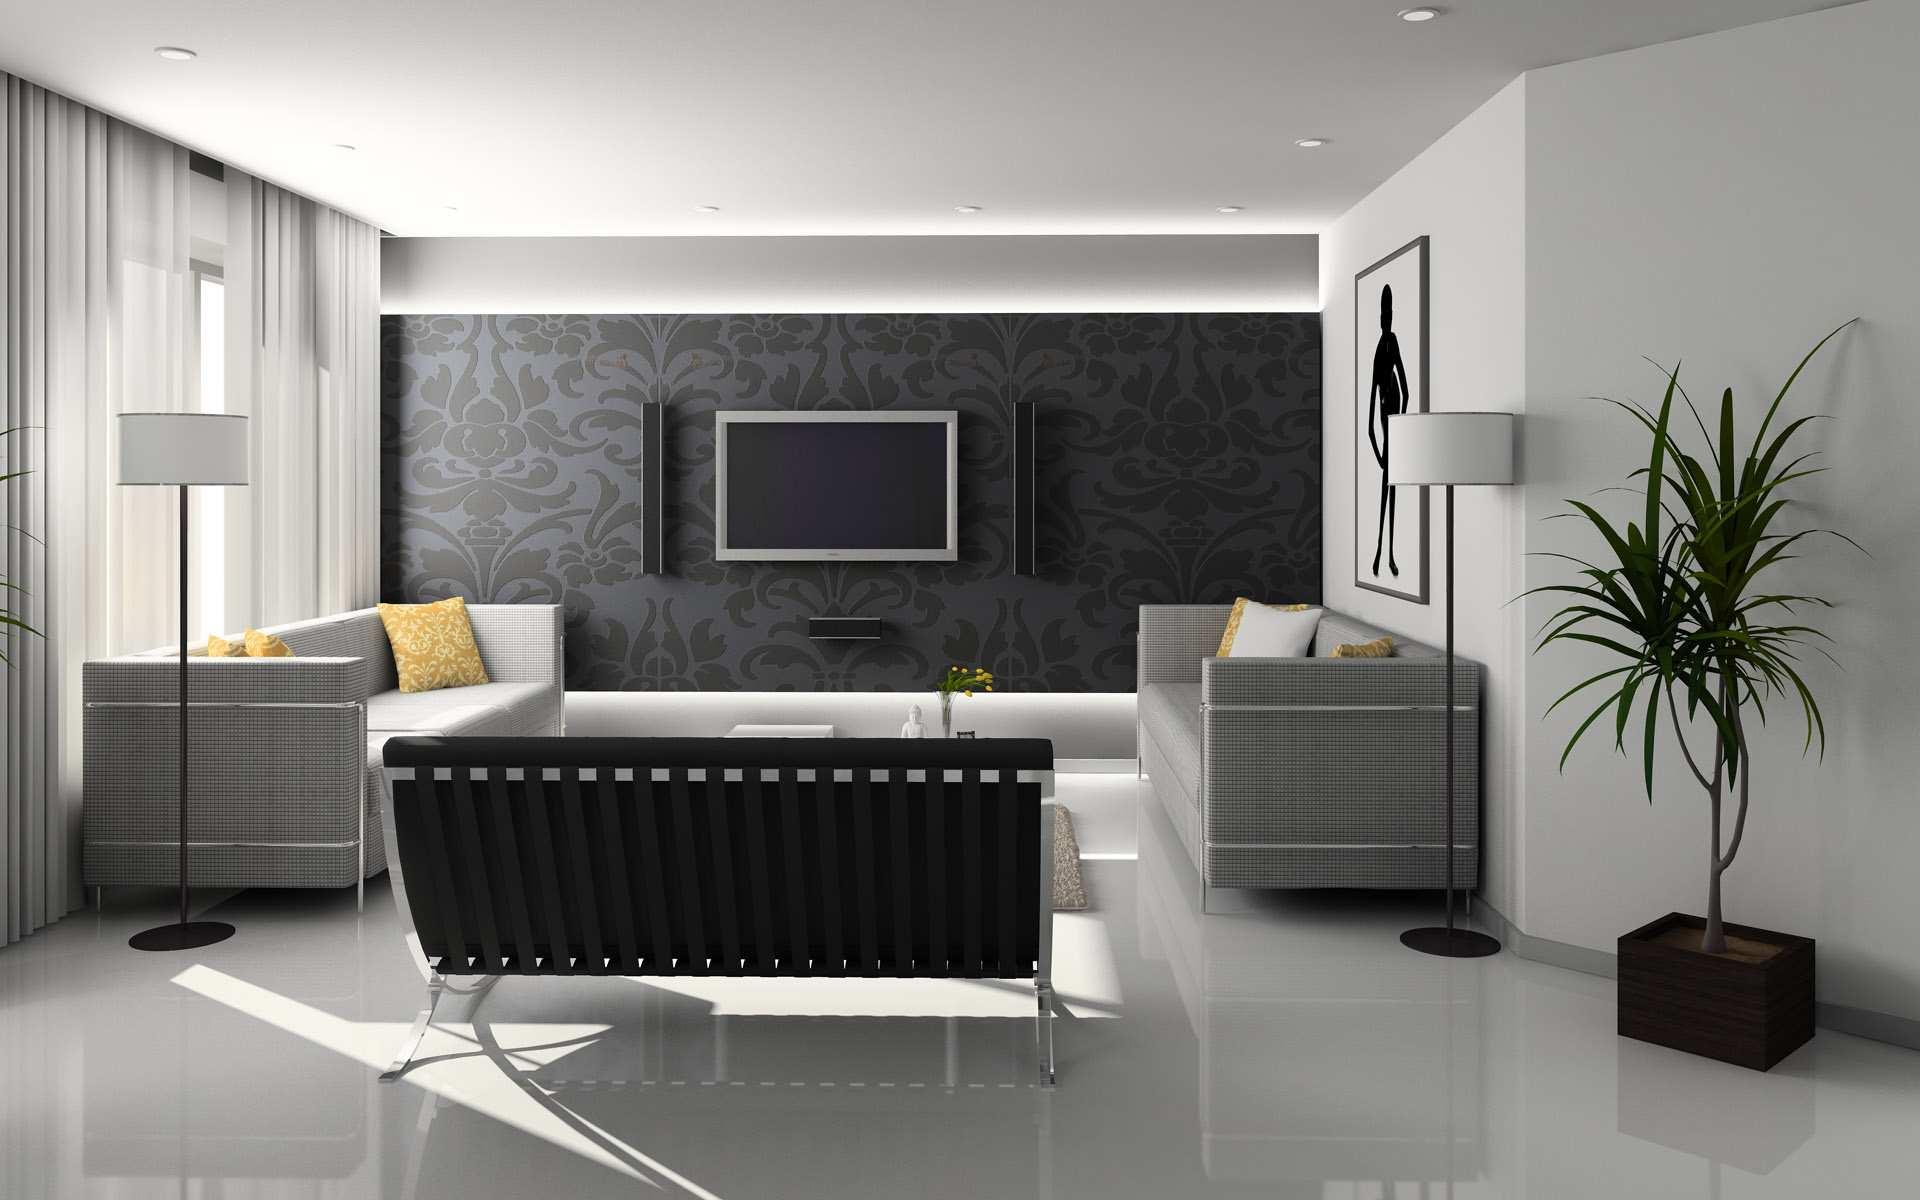 home-interior-design-ideas-414-home-interior-design-ideas1920-x-1200-142-kb-jpeg-x